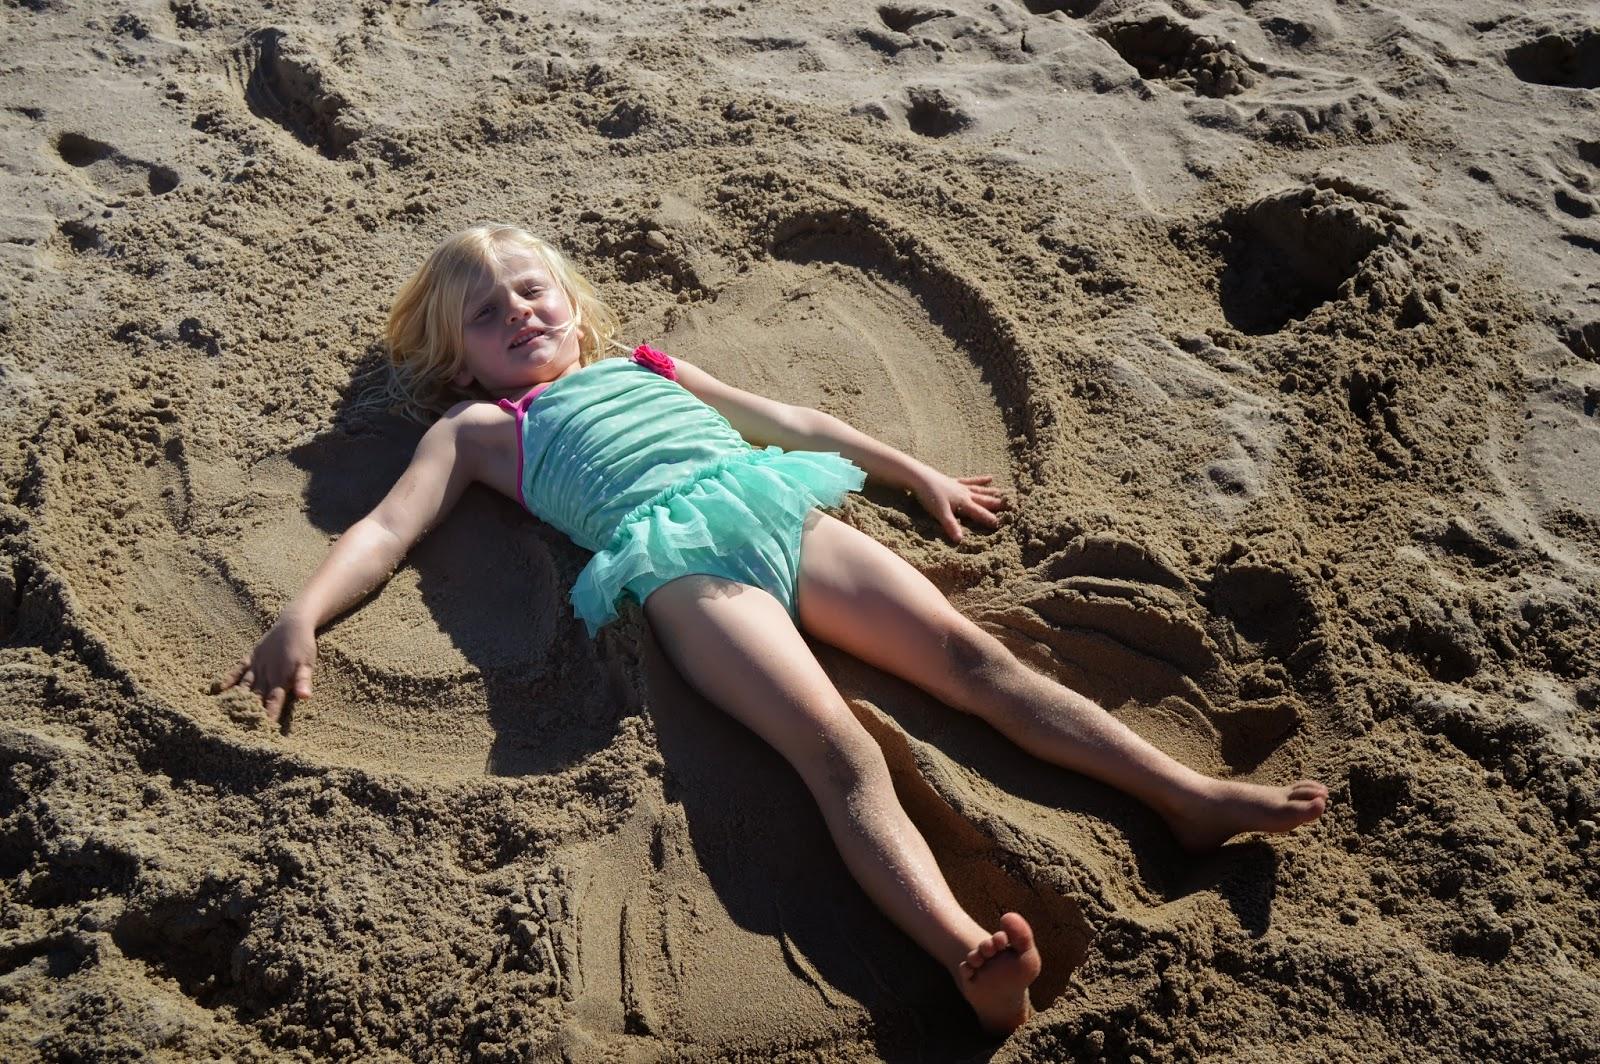 Bikini Nude Family Sunbathing Gif